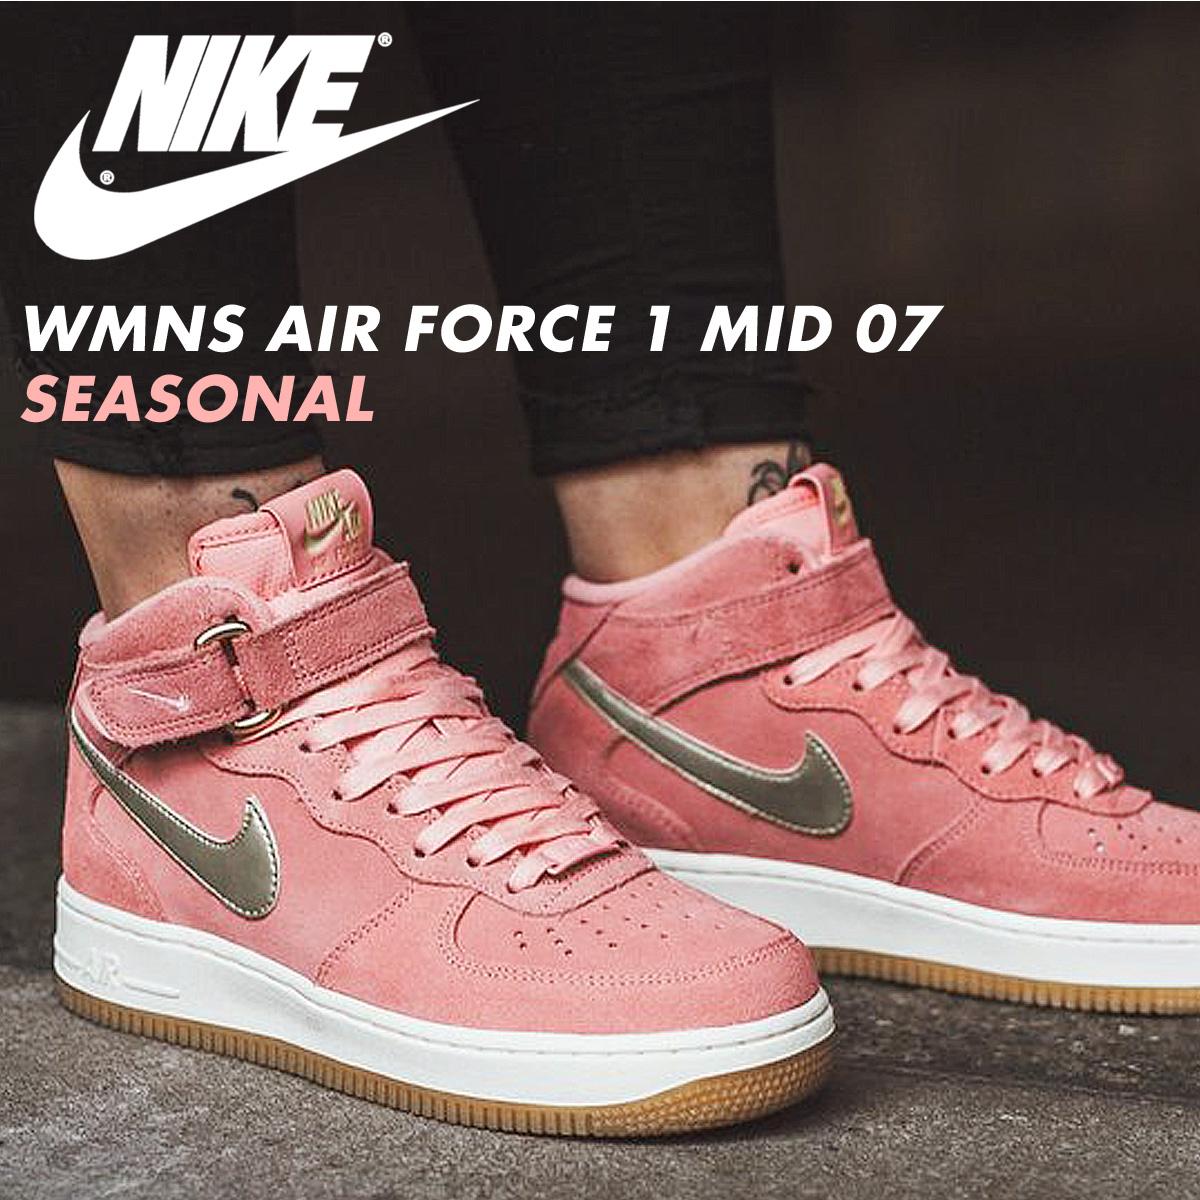 new arrivals mens pink nike air force 1 0adbb 42d19